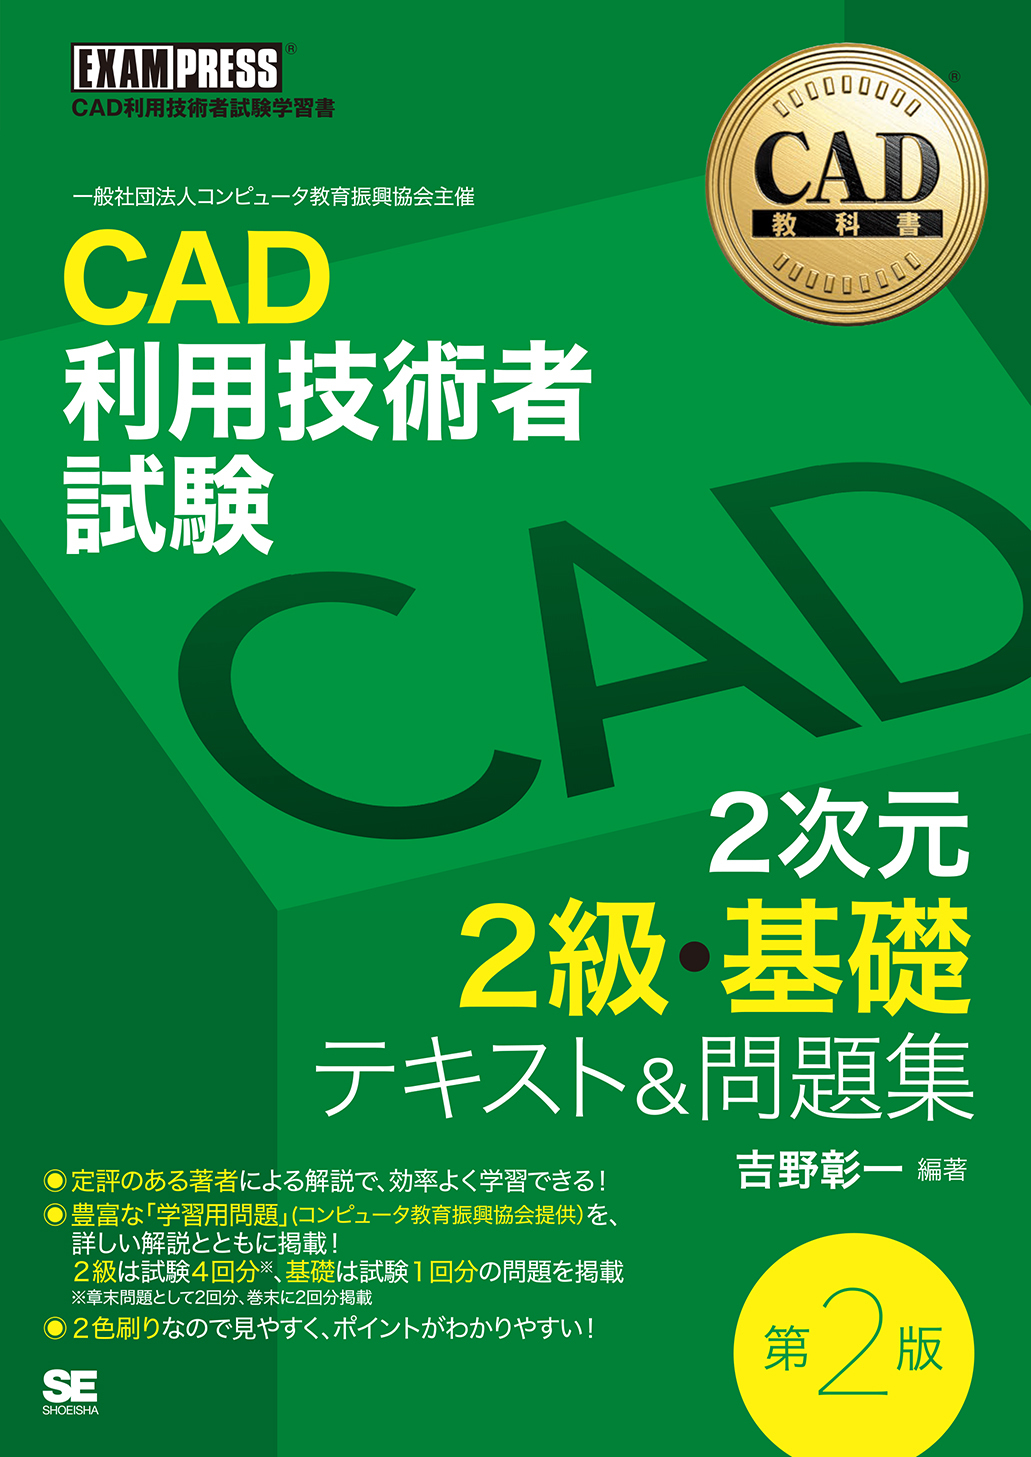 CAD利用技術者試験 2次元2級・基礎 テキスト&問題集 第2版(翔泳社)